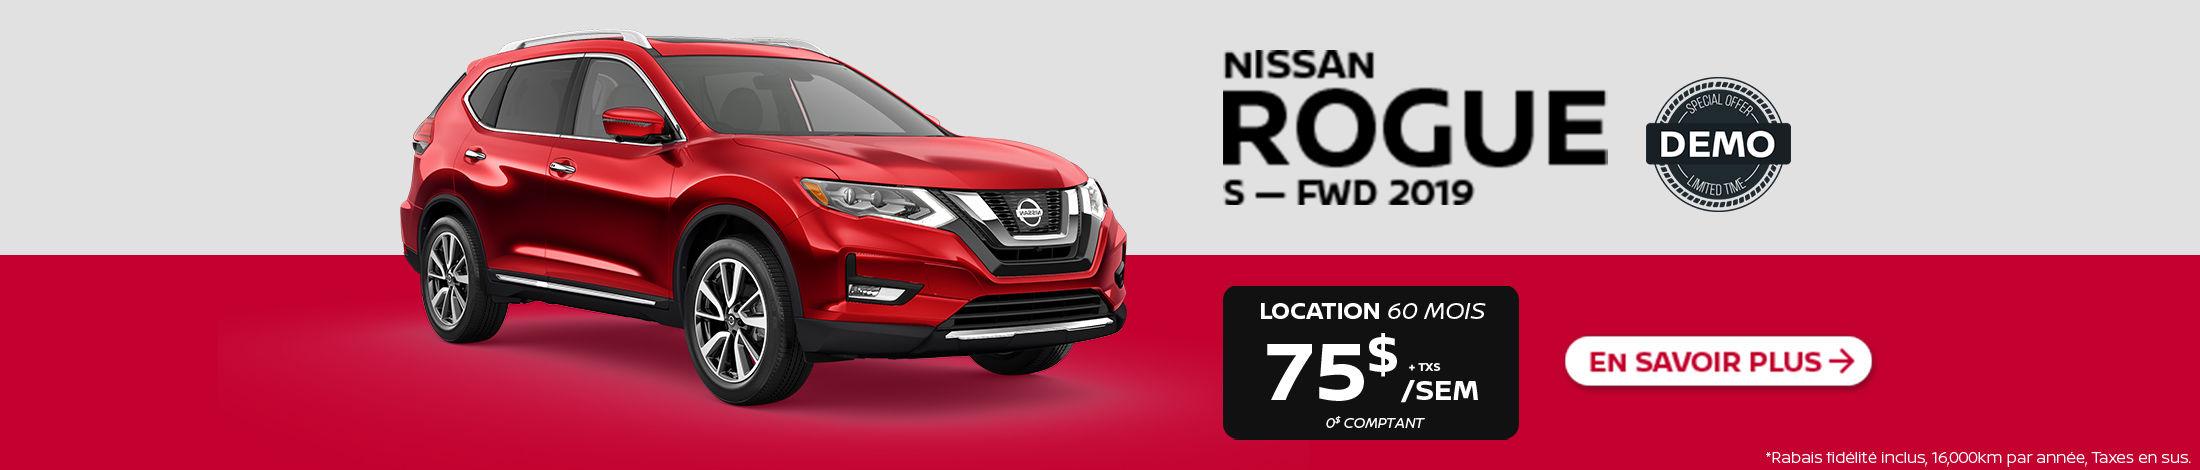 Nissan Rogue S 2019 FWD